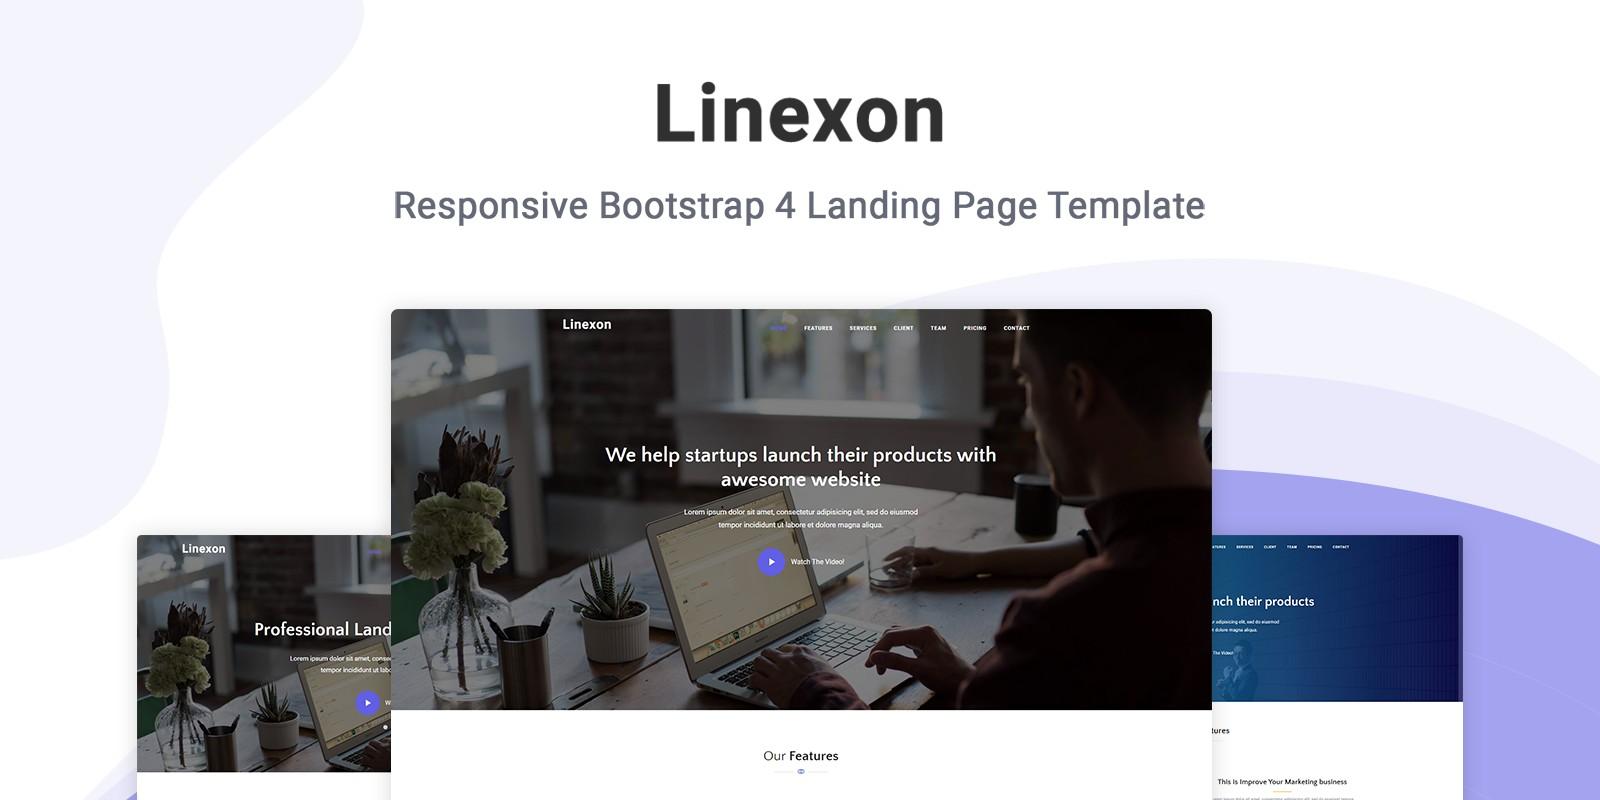 Linexon - Landing Page Template